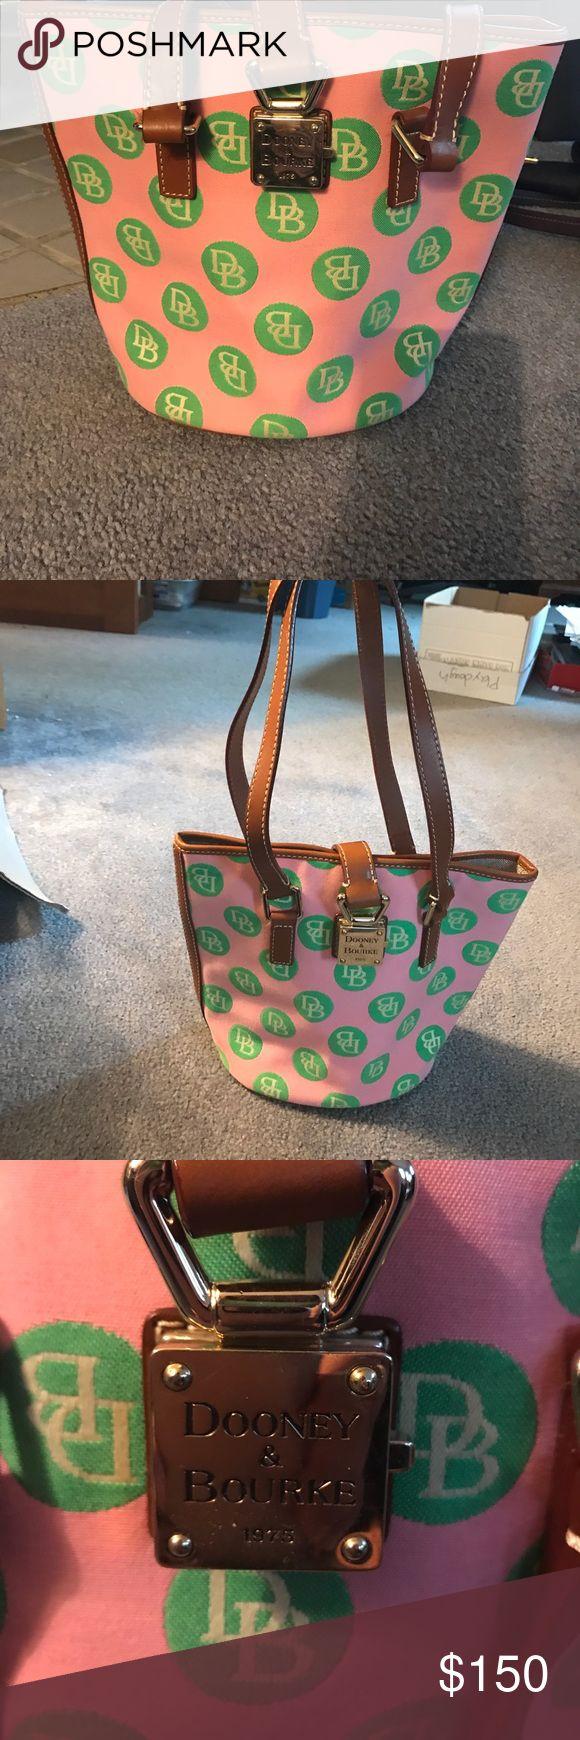 Dooney & Bourke pink and green polka dot handbag Great condition! Barely used! Bucket sized Dooney & Bourke handbag. It is pink with green polka dots with DB inside. Dooney & Bourke Bags Shoulder Bags